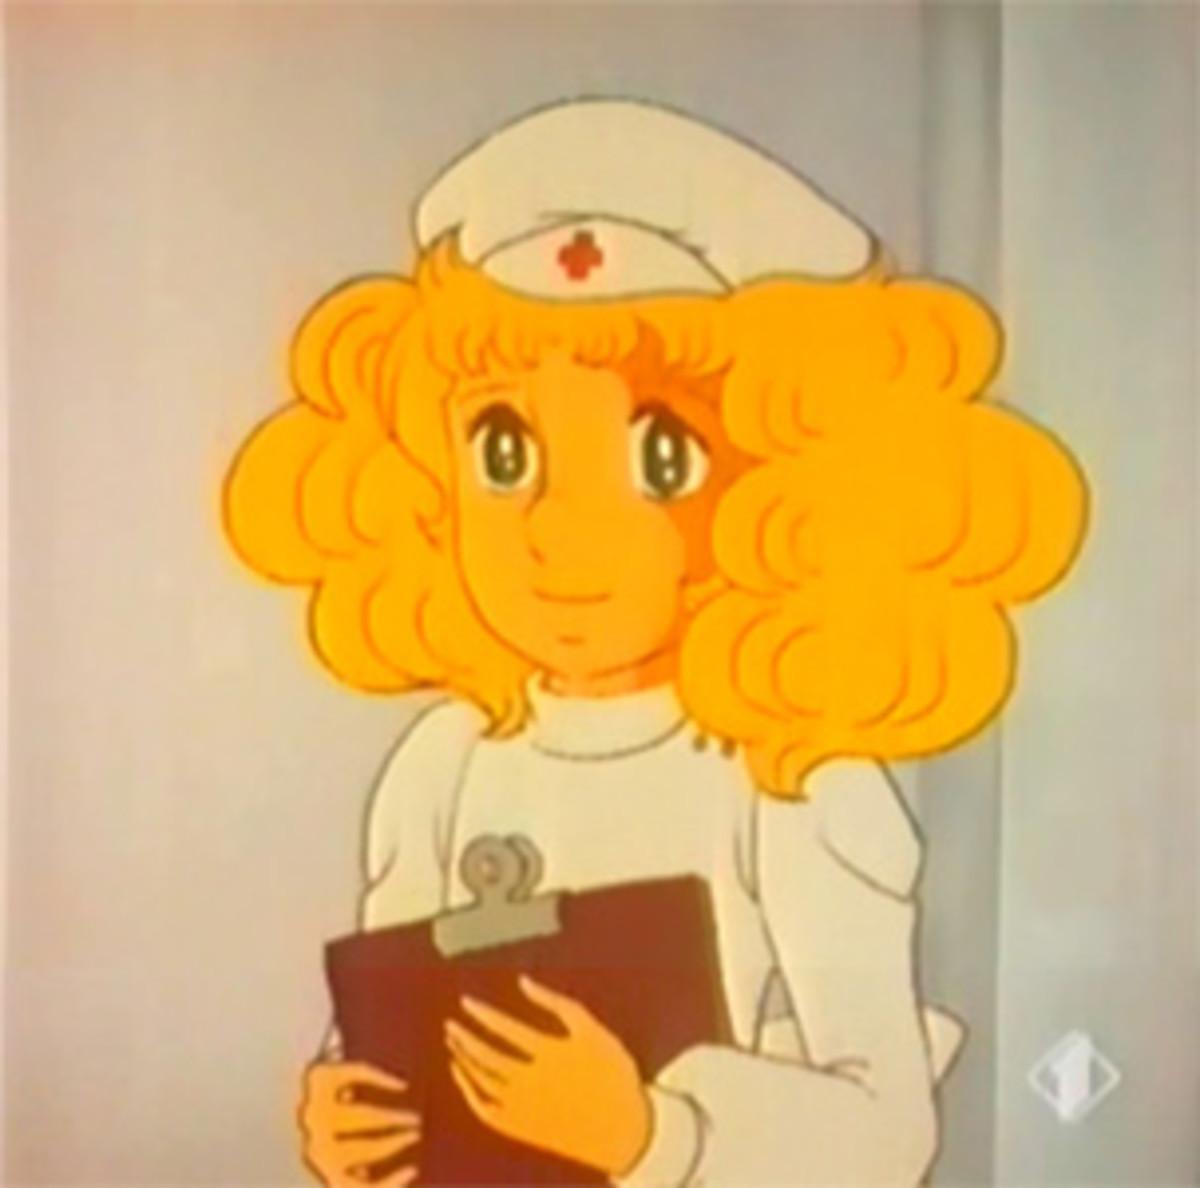 Candy nurse